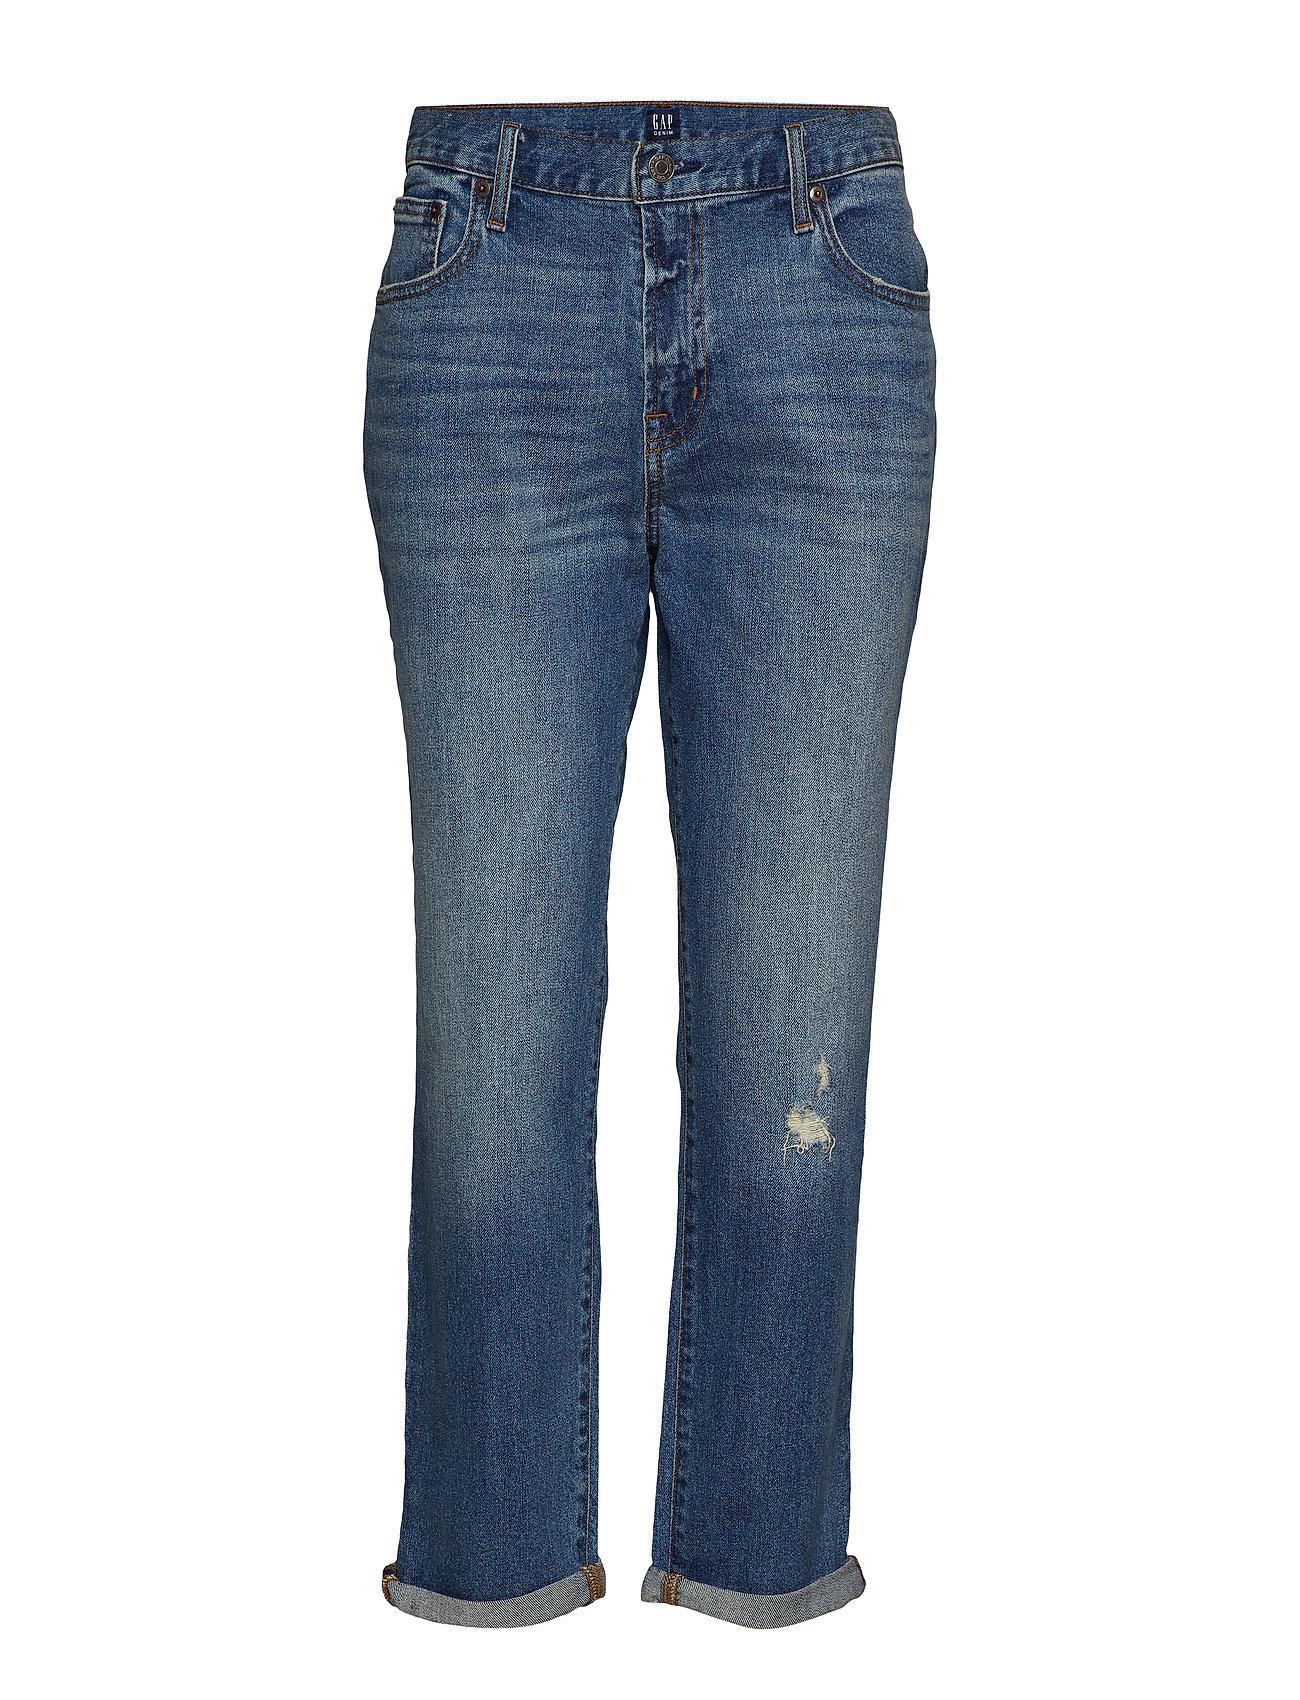 GAP Mid Rise Girlfriend Jeans - MEDIUM INDIGO 8